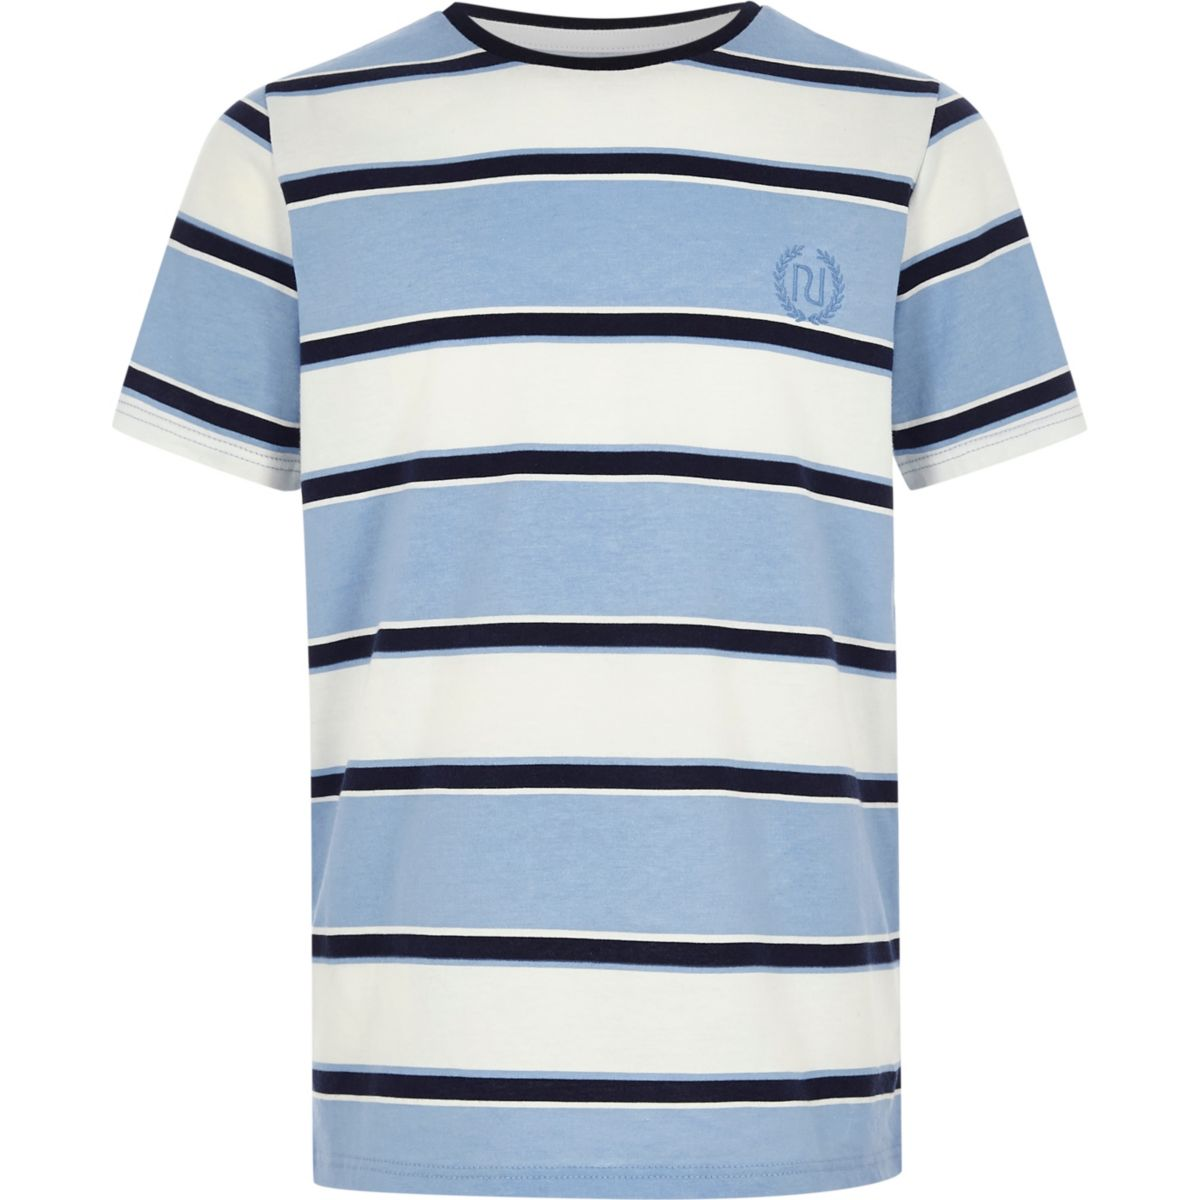 Boys blue stripe 'RI' embroidered T-shirt